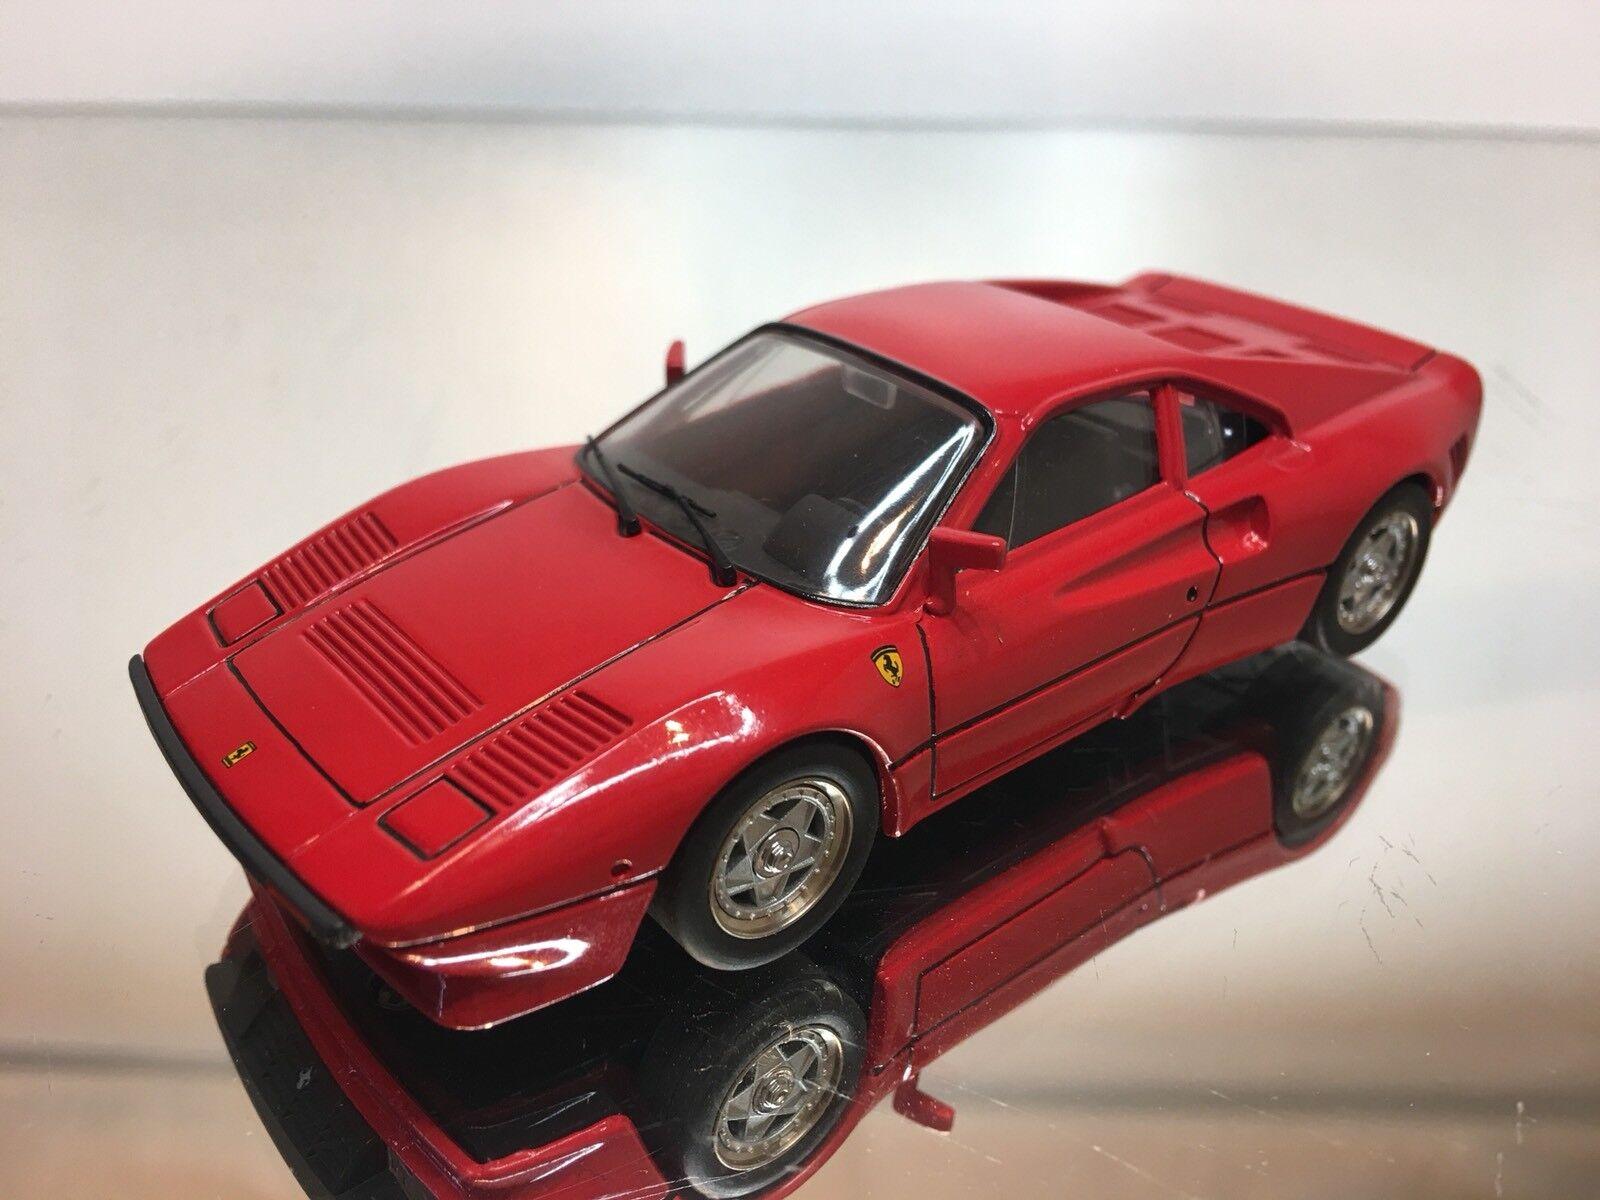 HAG SWISS FERRARI 288 GTO röd 1 43 EXCELLENT KONDITIONEN